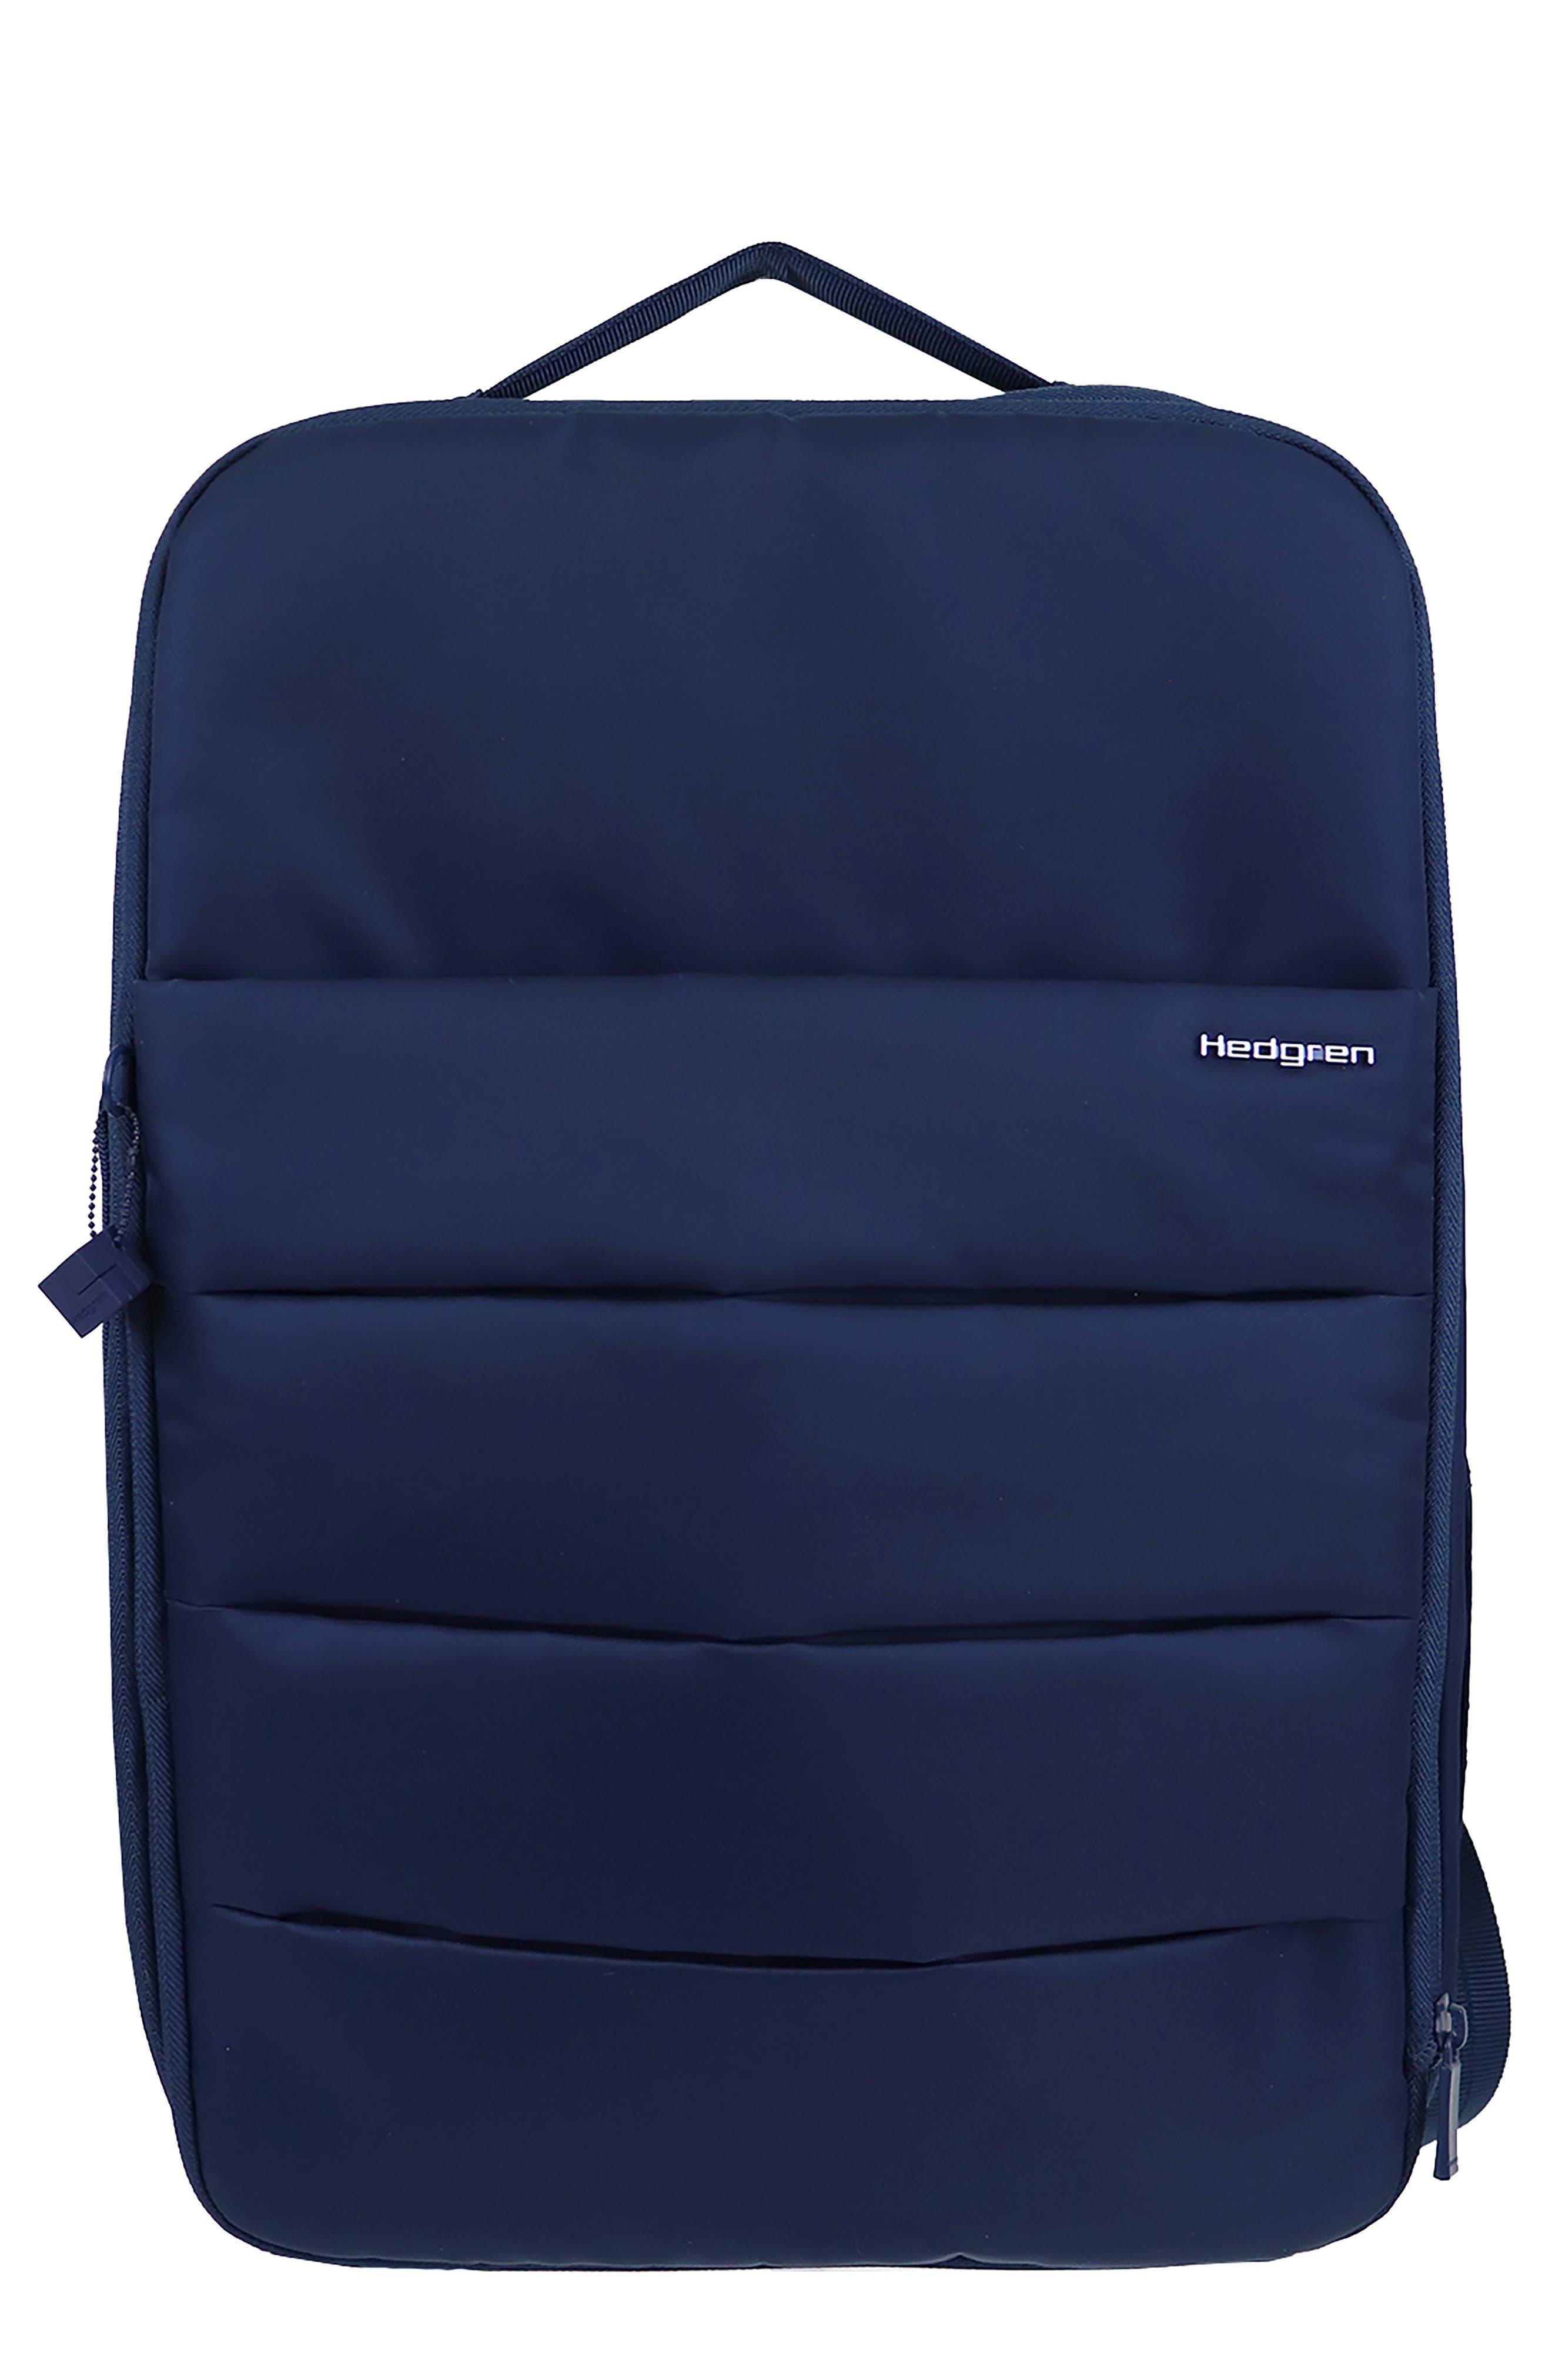 Lattitude Equator Water Repellent Backpack